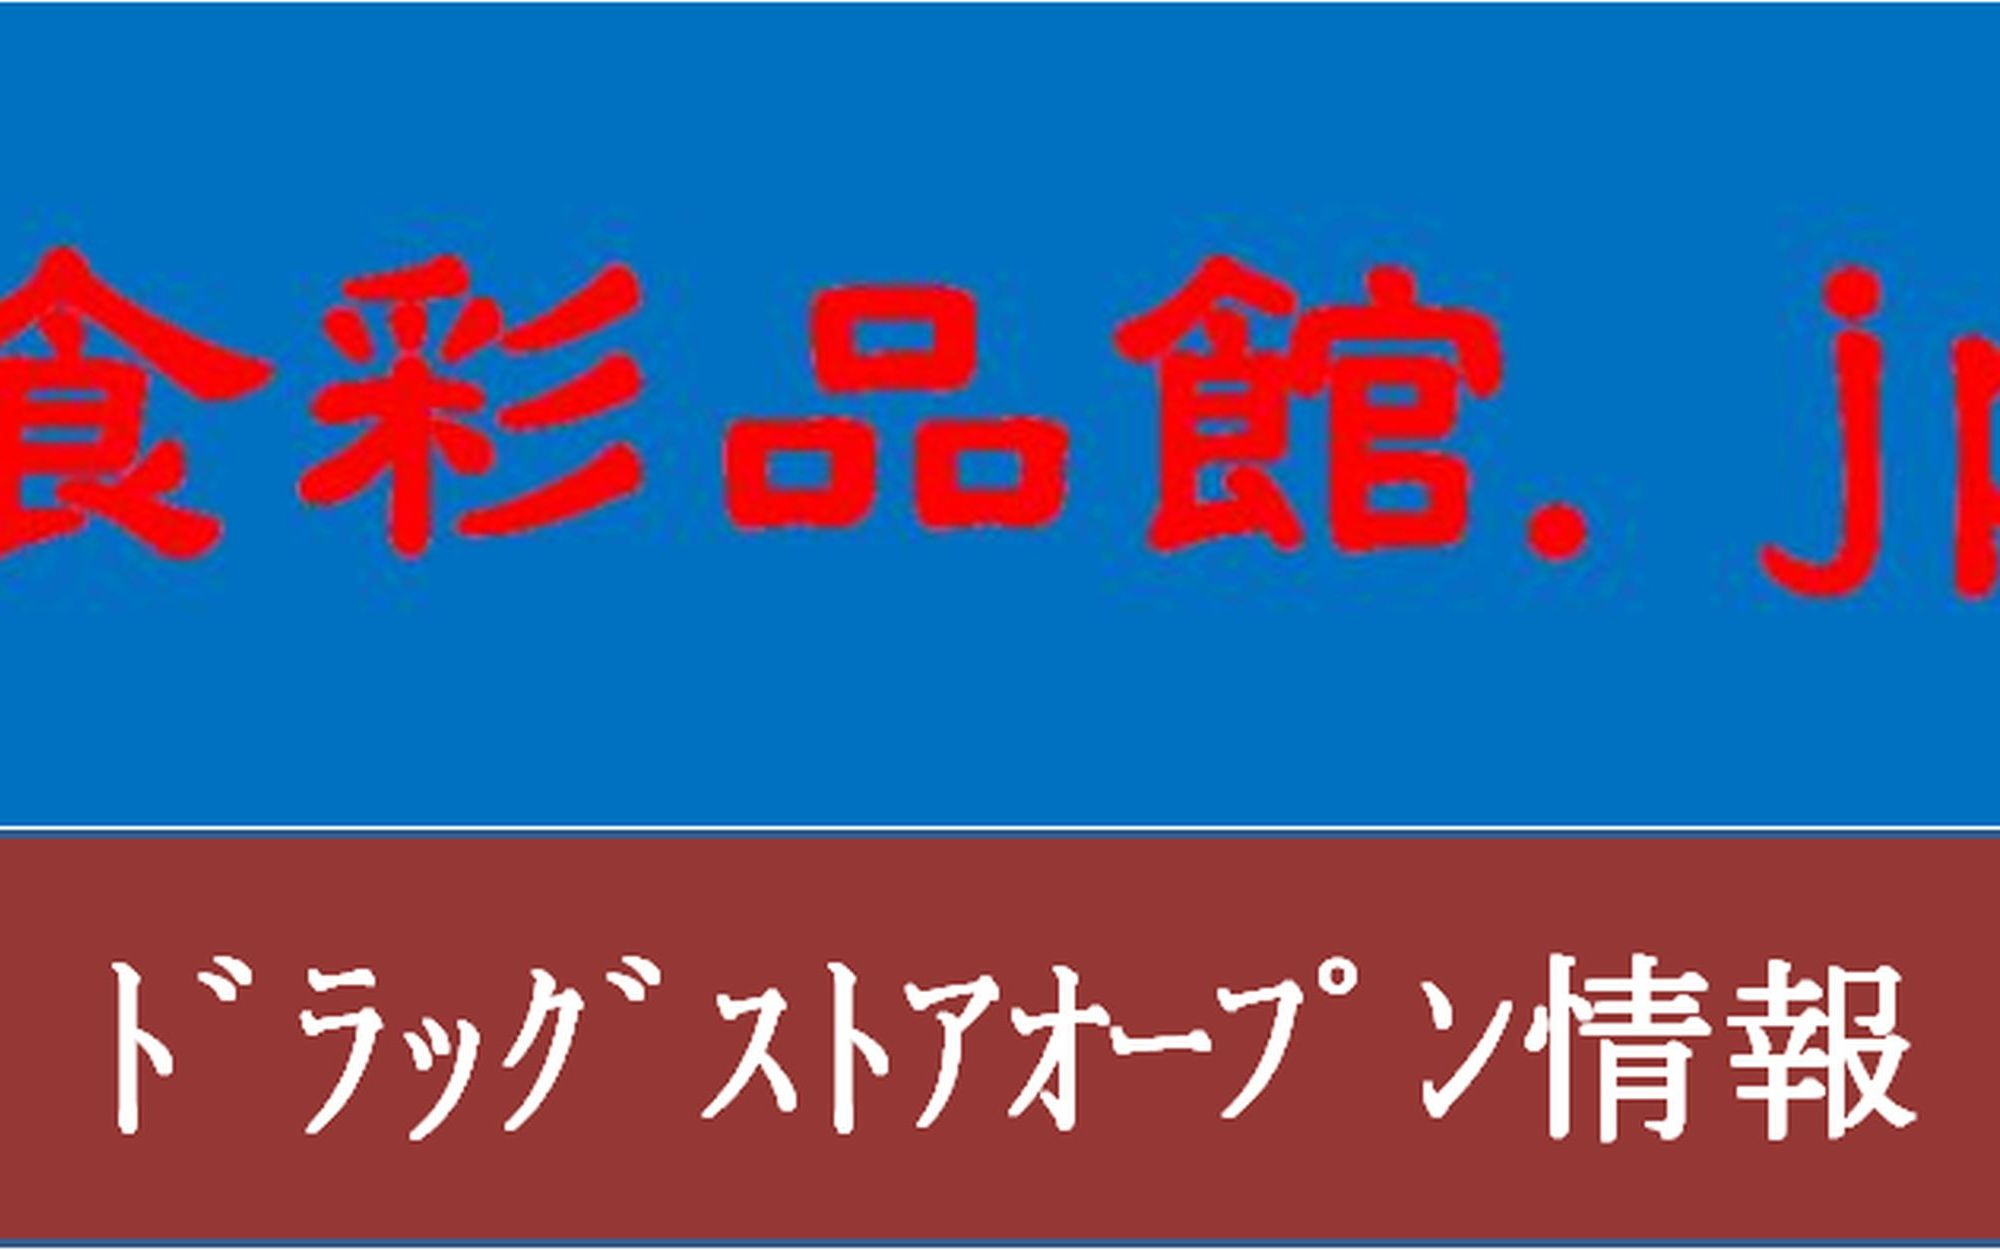 mac黒潮店(マック,高知県幡多郡)2020年10月13日オープン予定で大店立地届出